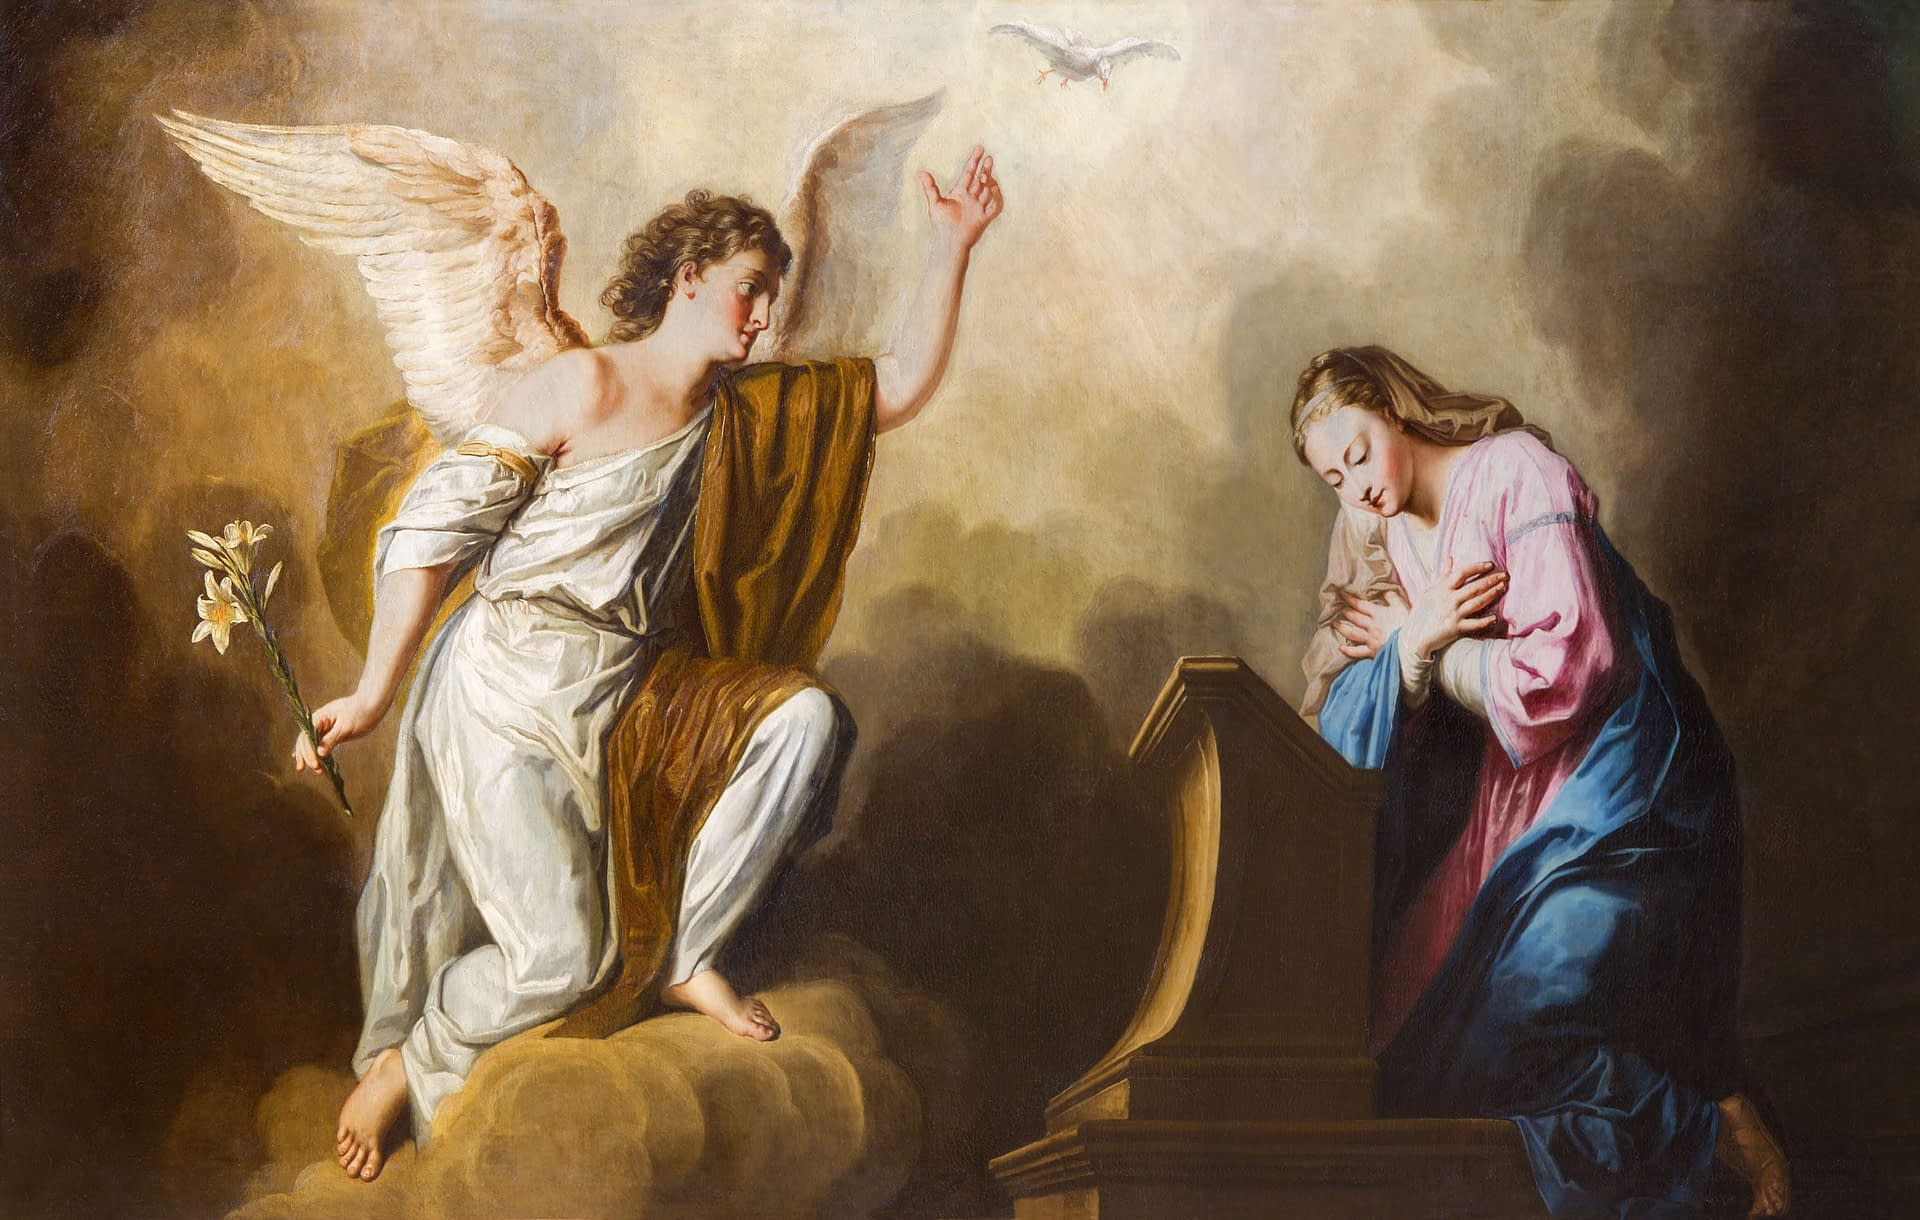 Vienna - Annunciation paint in presbytery of Salesianerkirche By Renáta Sedmáková